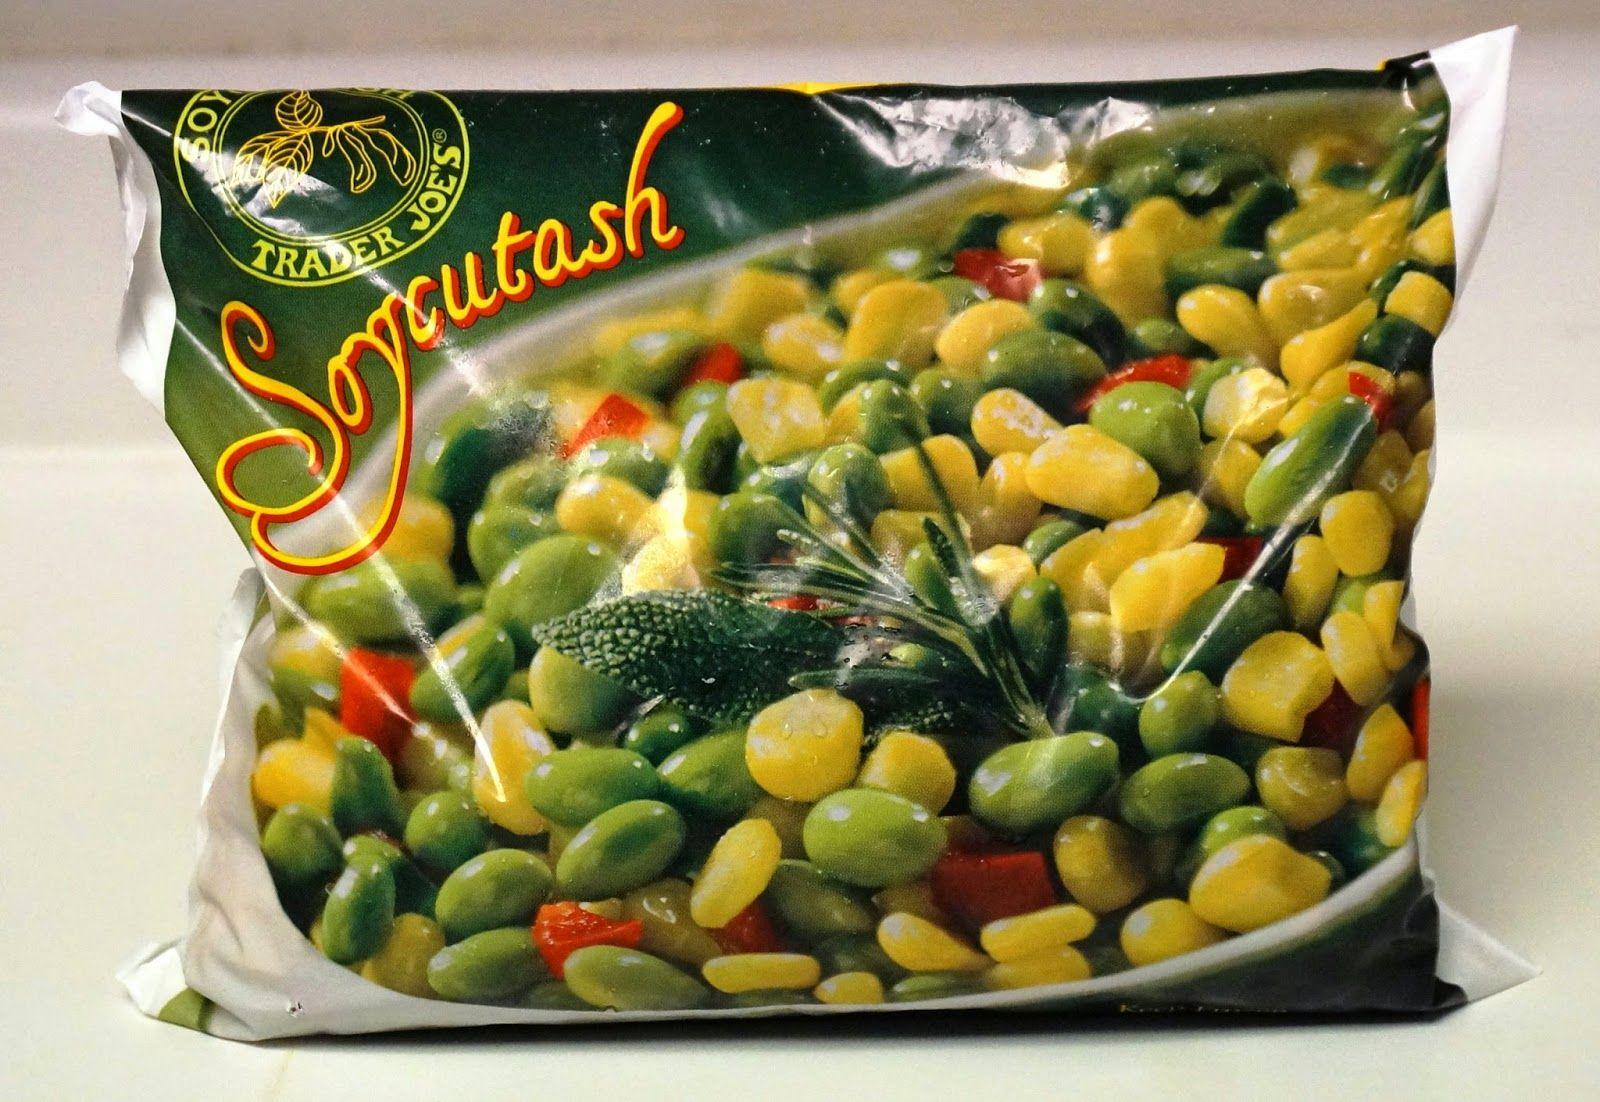 Trader Joe S Soycutash High Protein Vegan Cooking Recipes